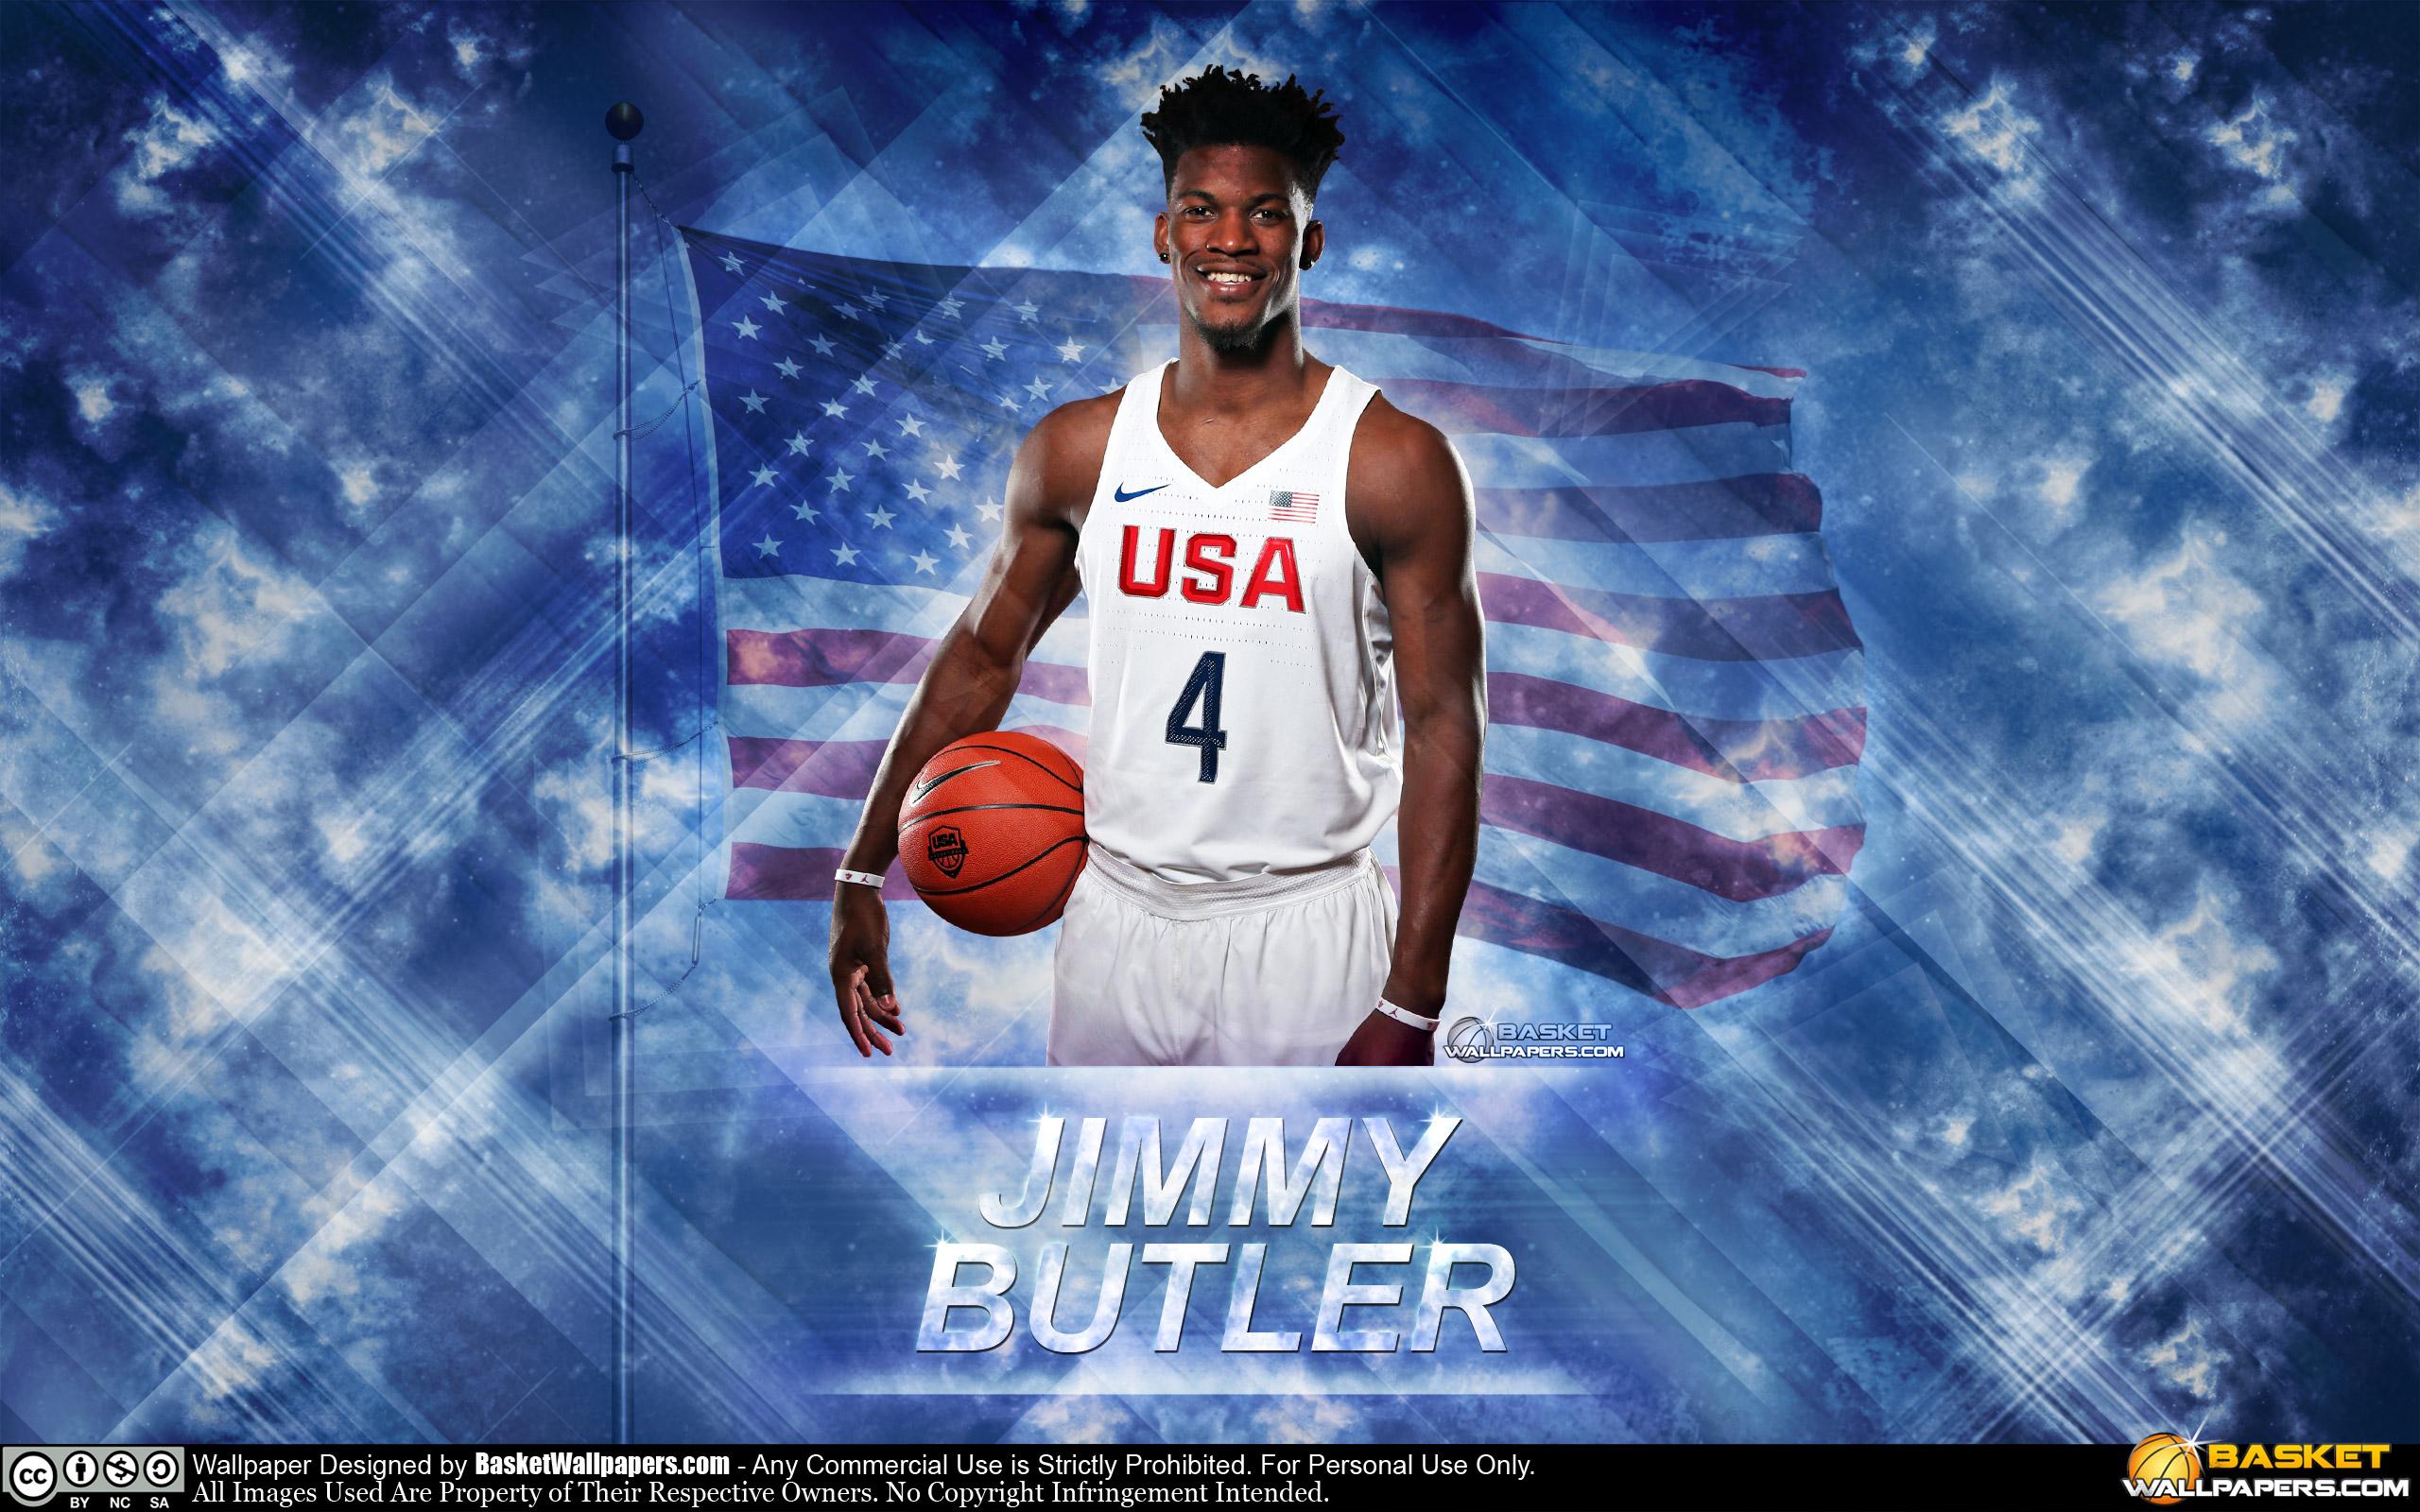 Jimmy Butler USA 2016 Olympics Wallpaper Basketball Wallpapers 2560x1600